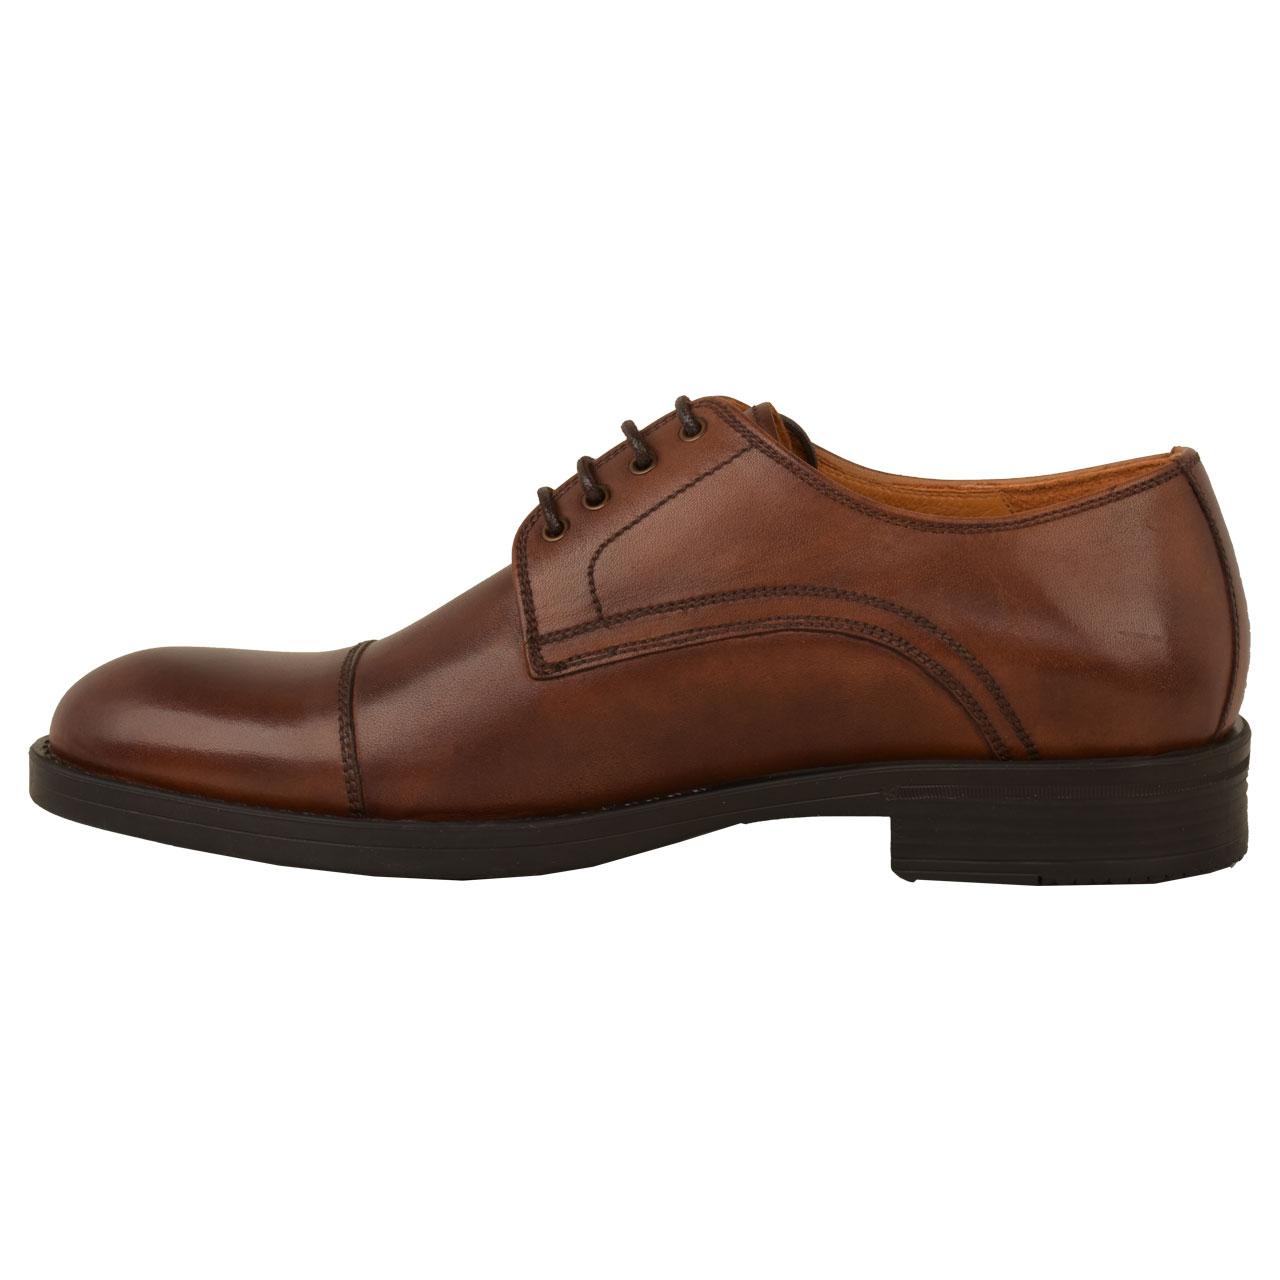 کفش مردانه پارینه چرم مدل SHO166-7